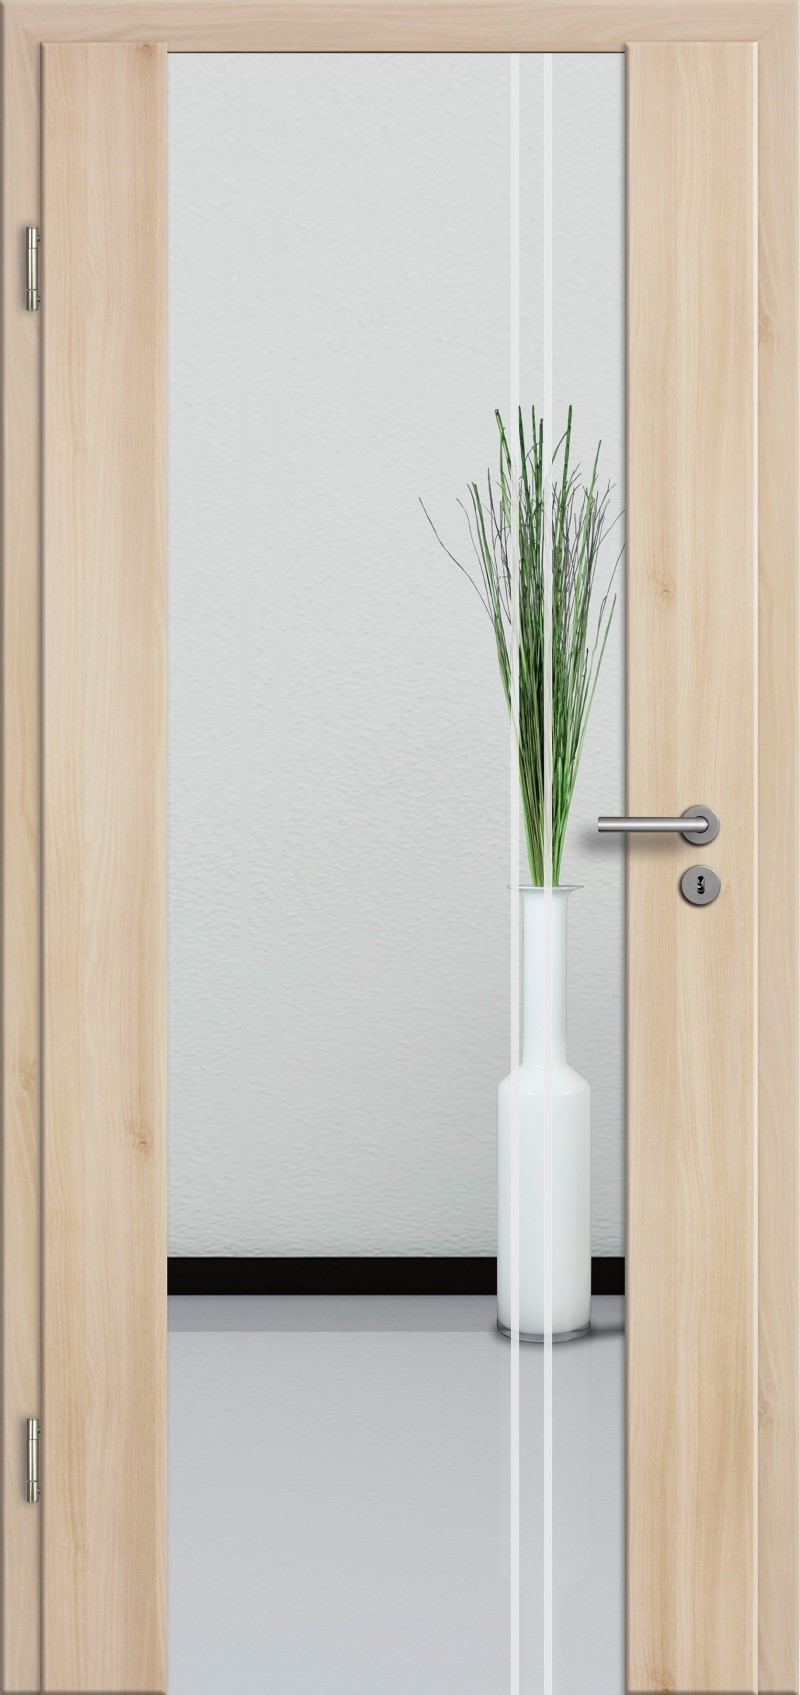 holzglast r mit glasmotiv sand 23 tuer und. Black Bedroom Furniture Sets. Home Design Ideas